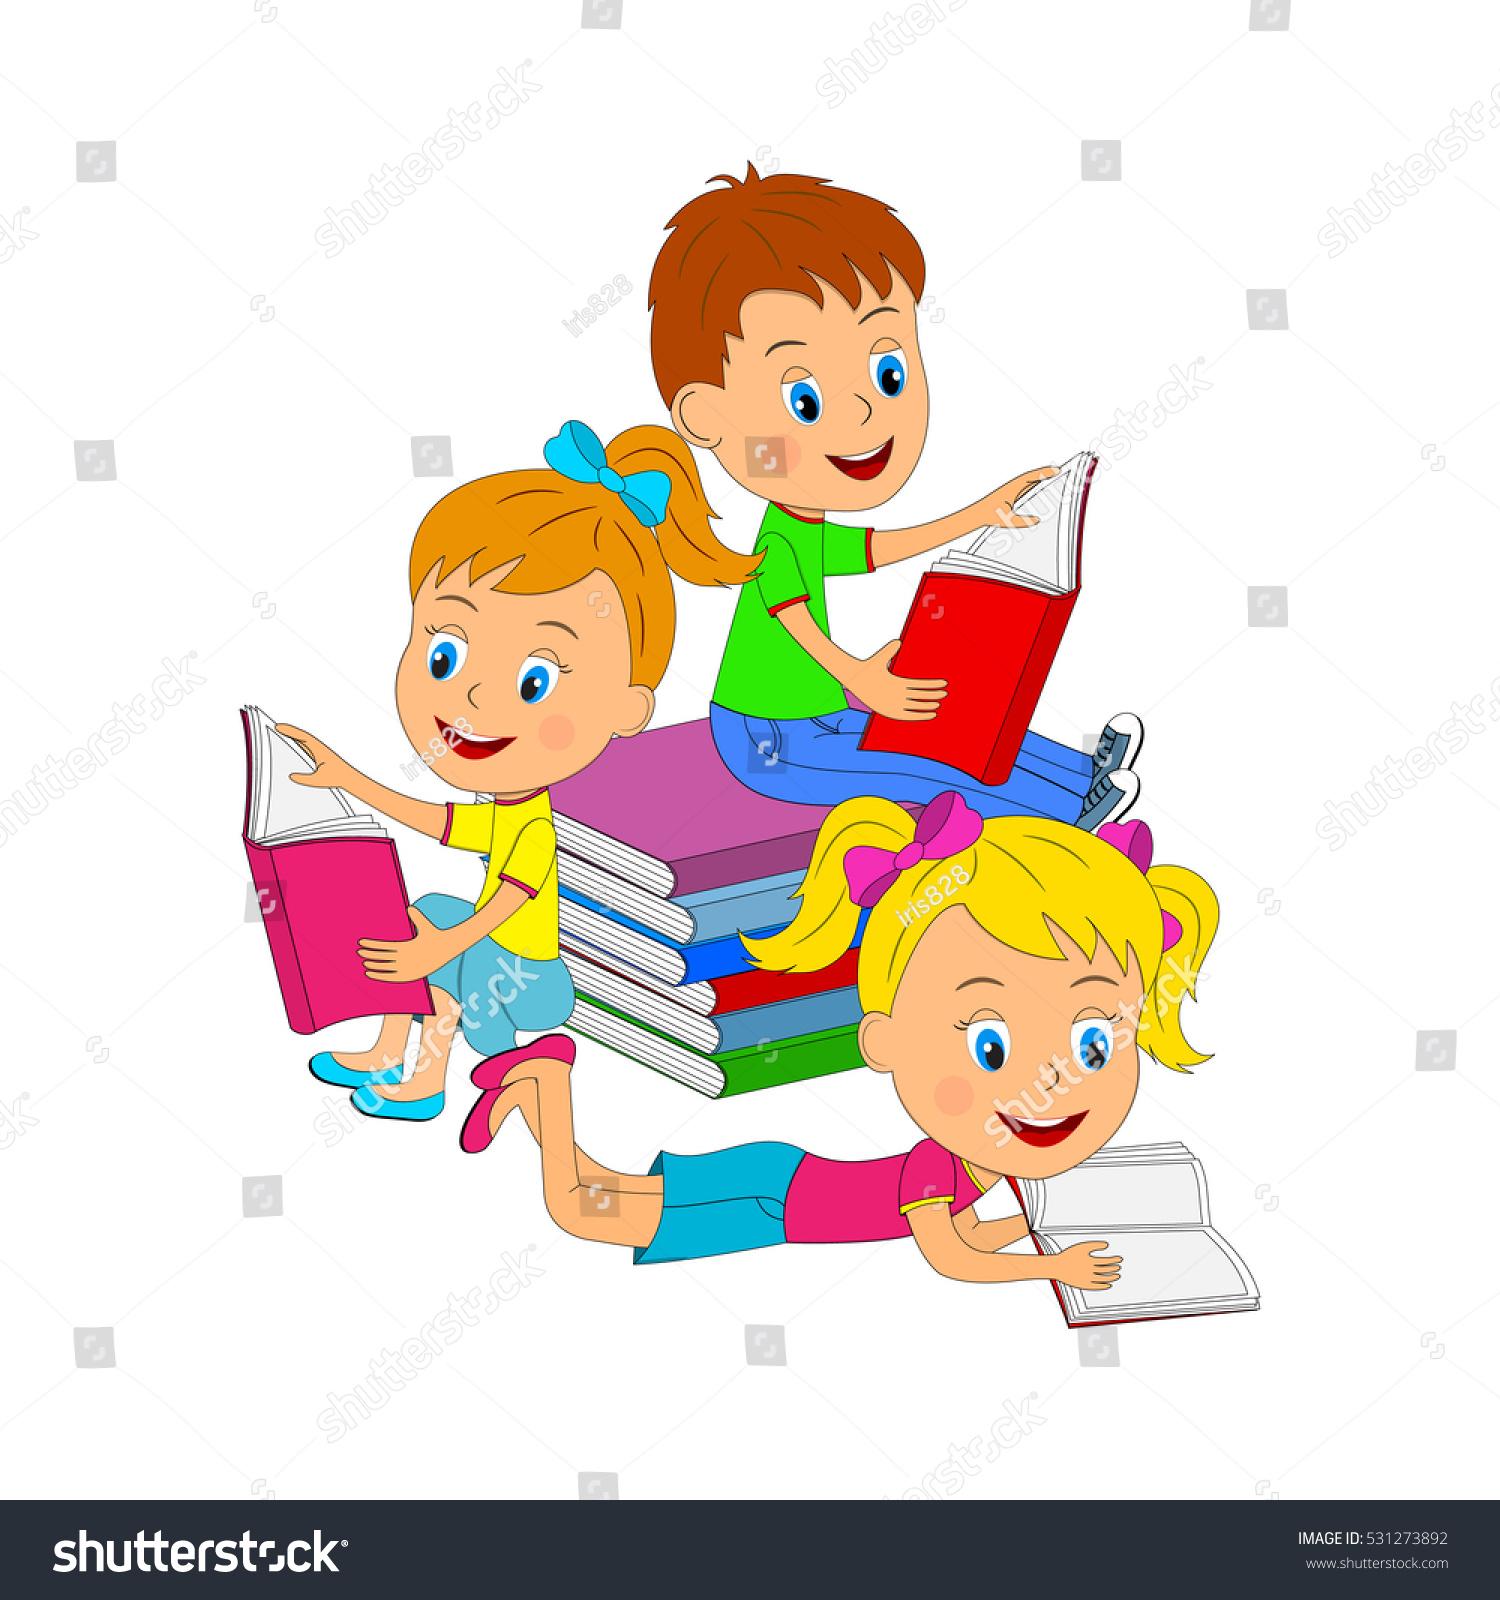 Children Book Cover Vector : Kidsboy girls reading book illustration vector stock